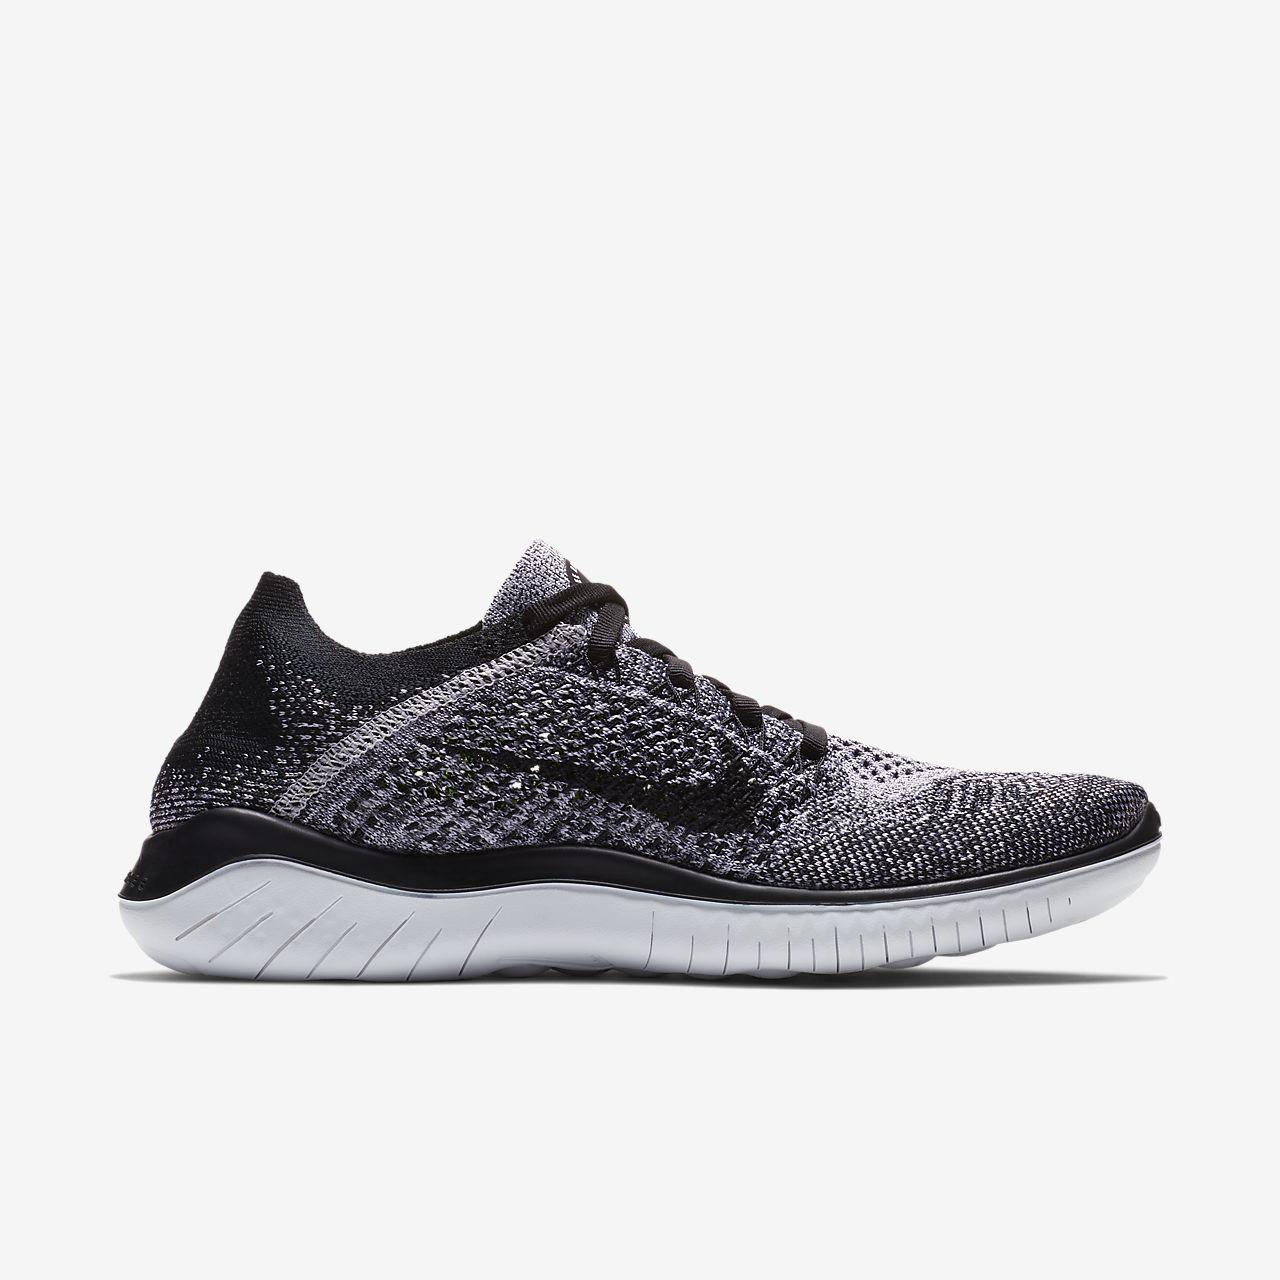 designer fashion 0433a dd5ea Nike Free RN Flyknit 2018 Women's Running Shoe